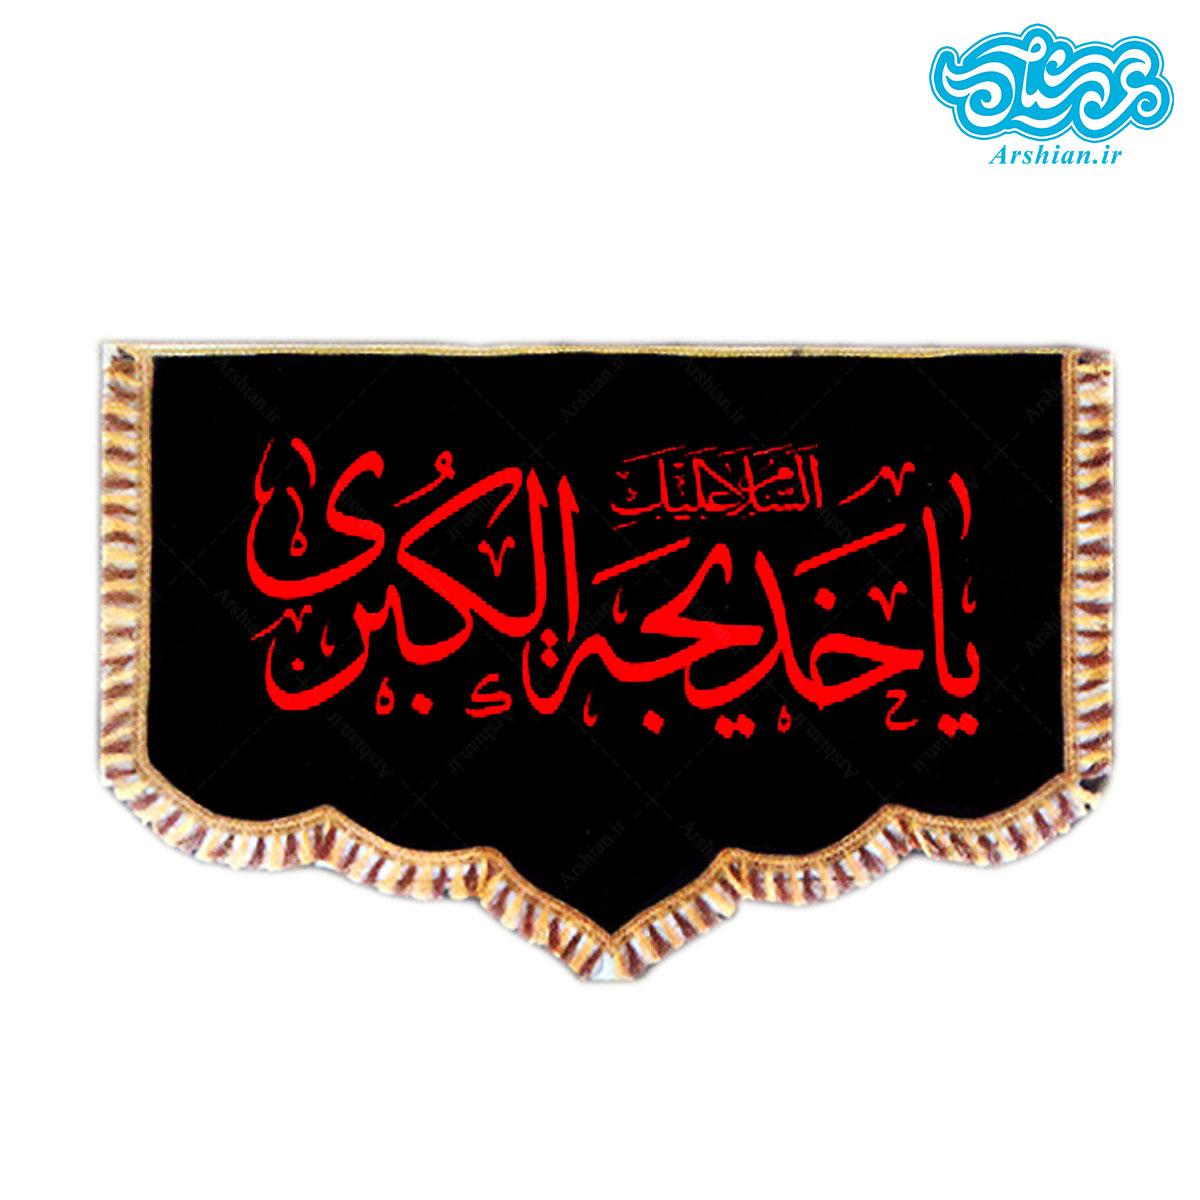 پرچم پشت منبری السلام علیک یا خدیجه الکبری کد 013